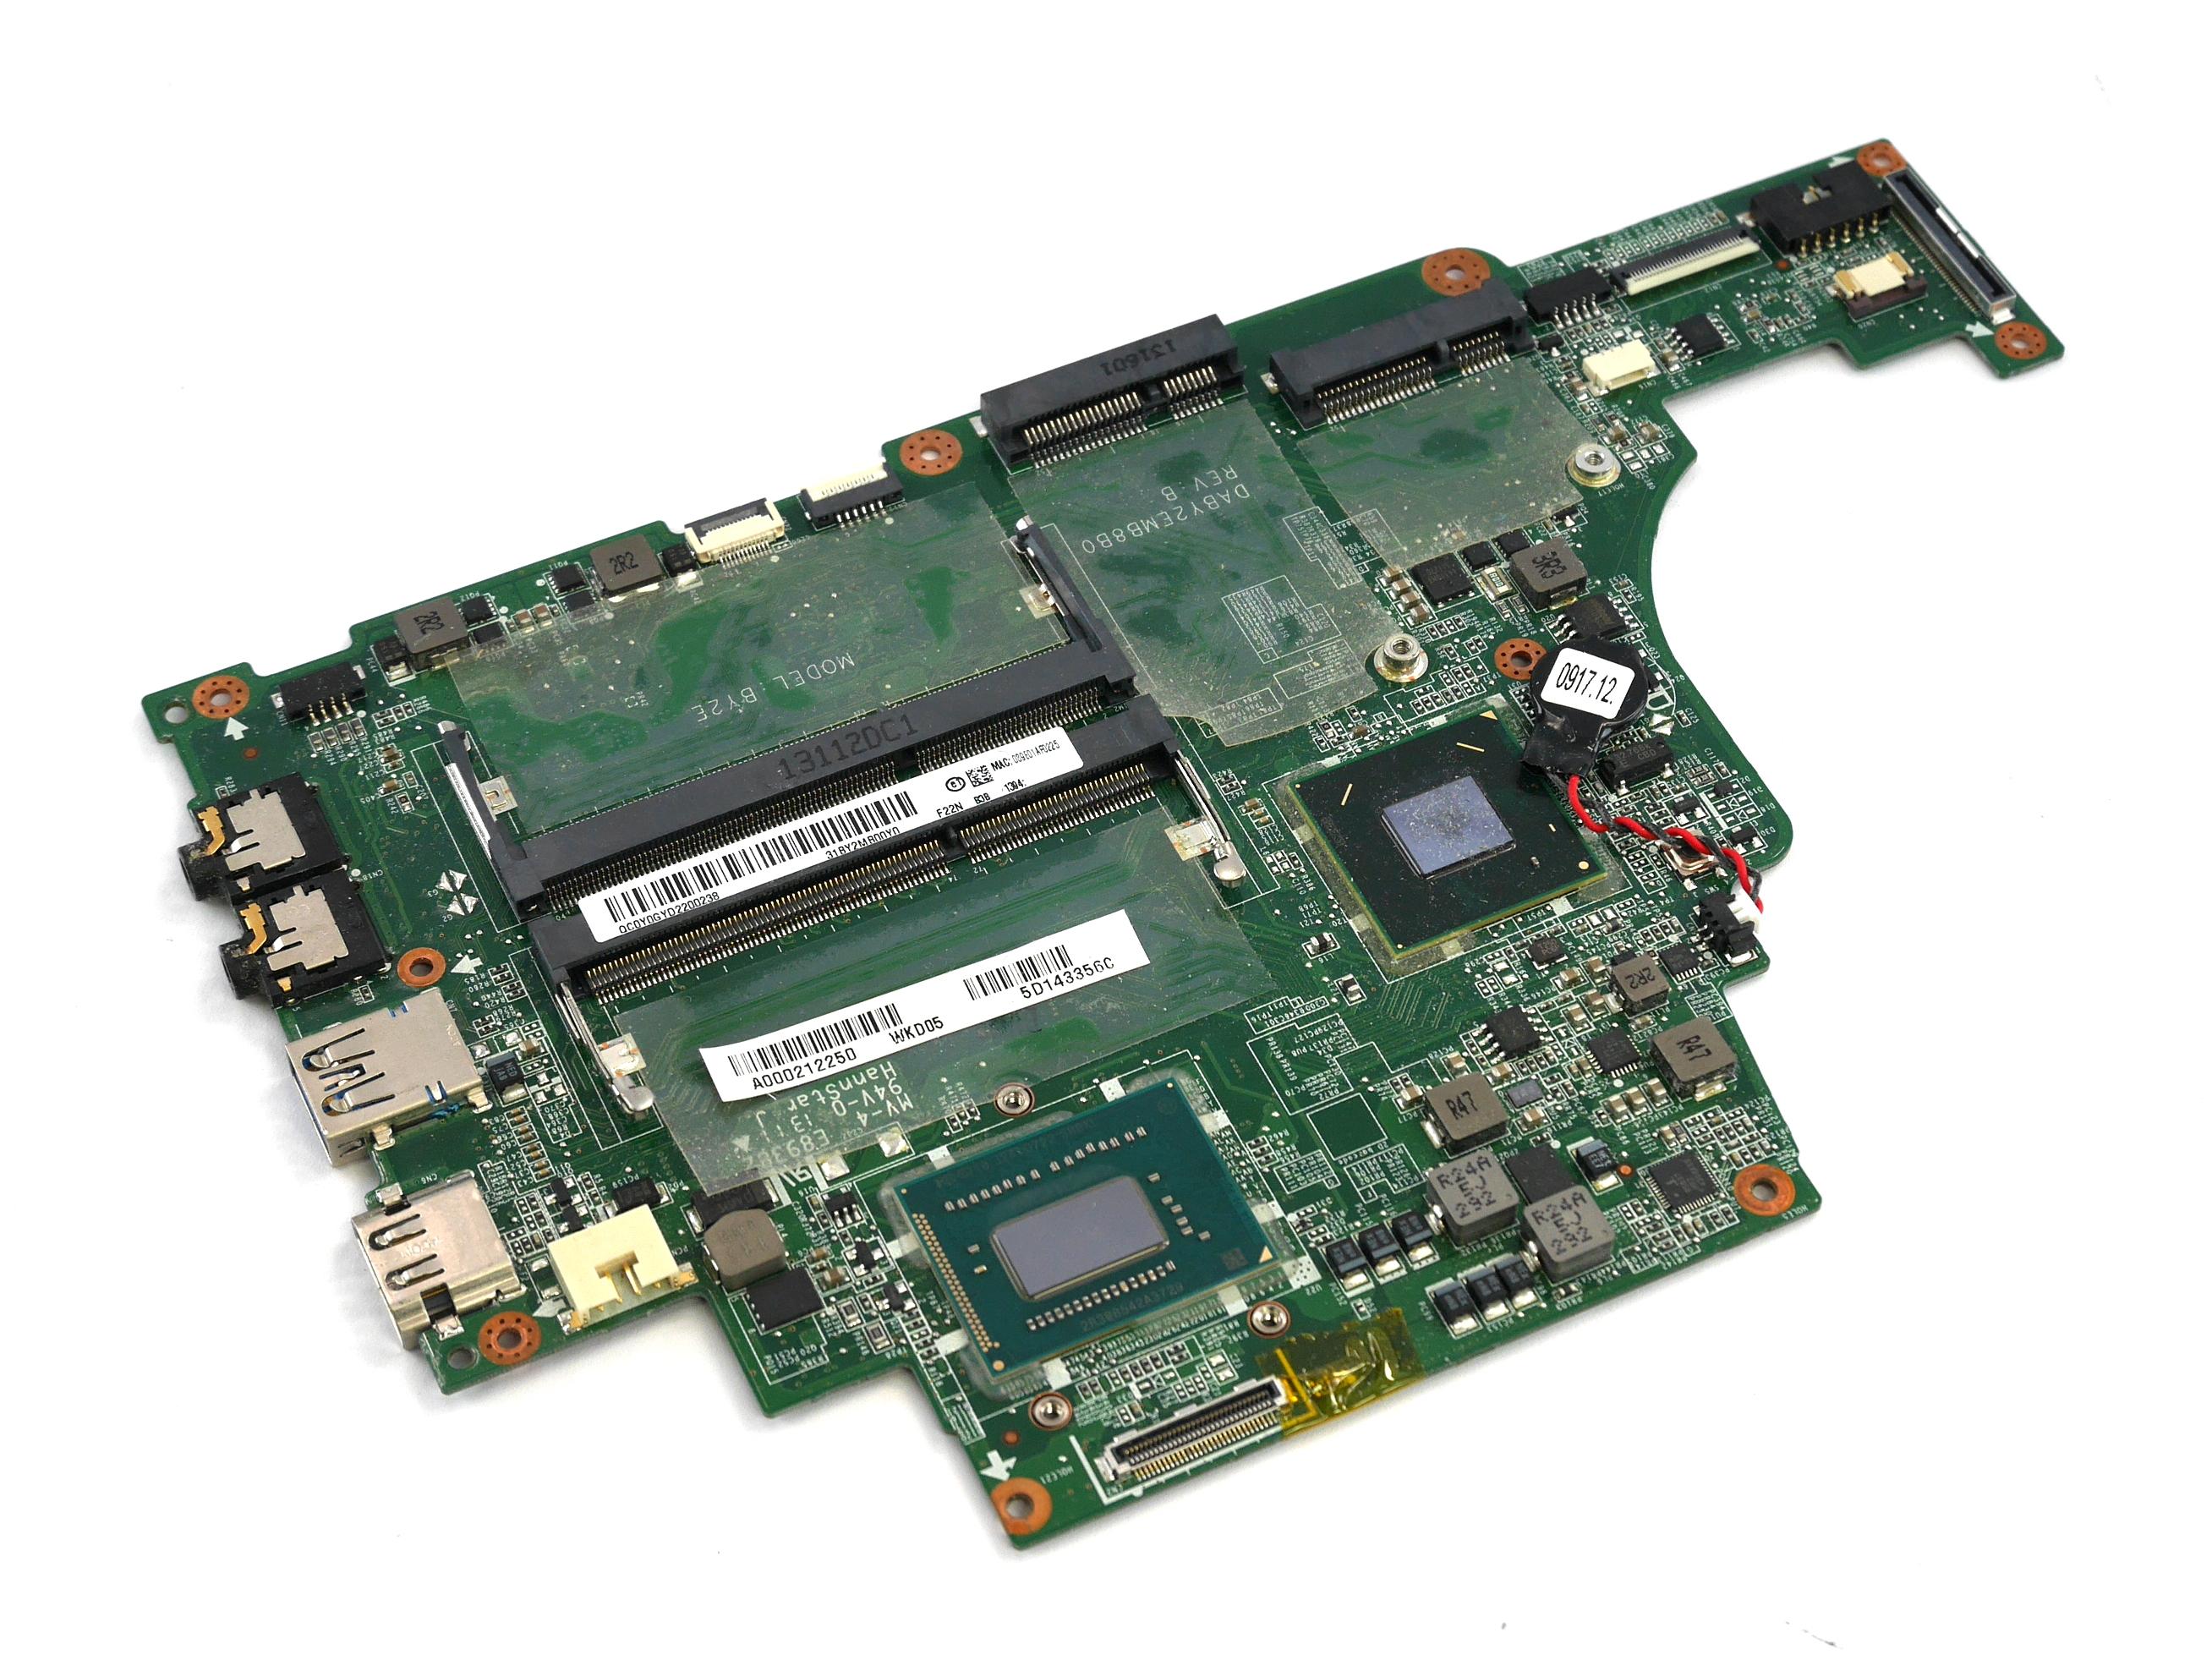 A000212250 Toshiba Satellite U840T-103 Motherboard with Intel i5 -3337U BGA CPU